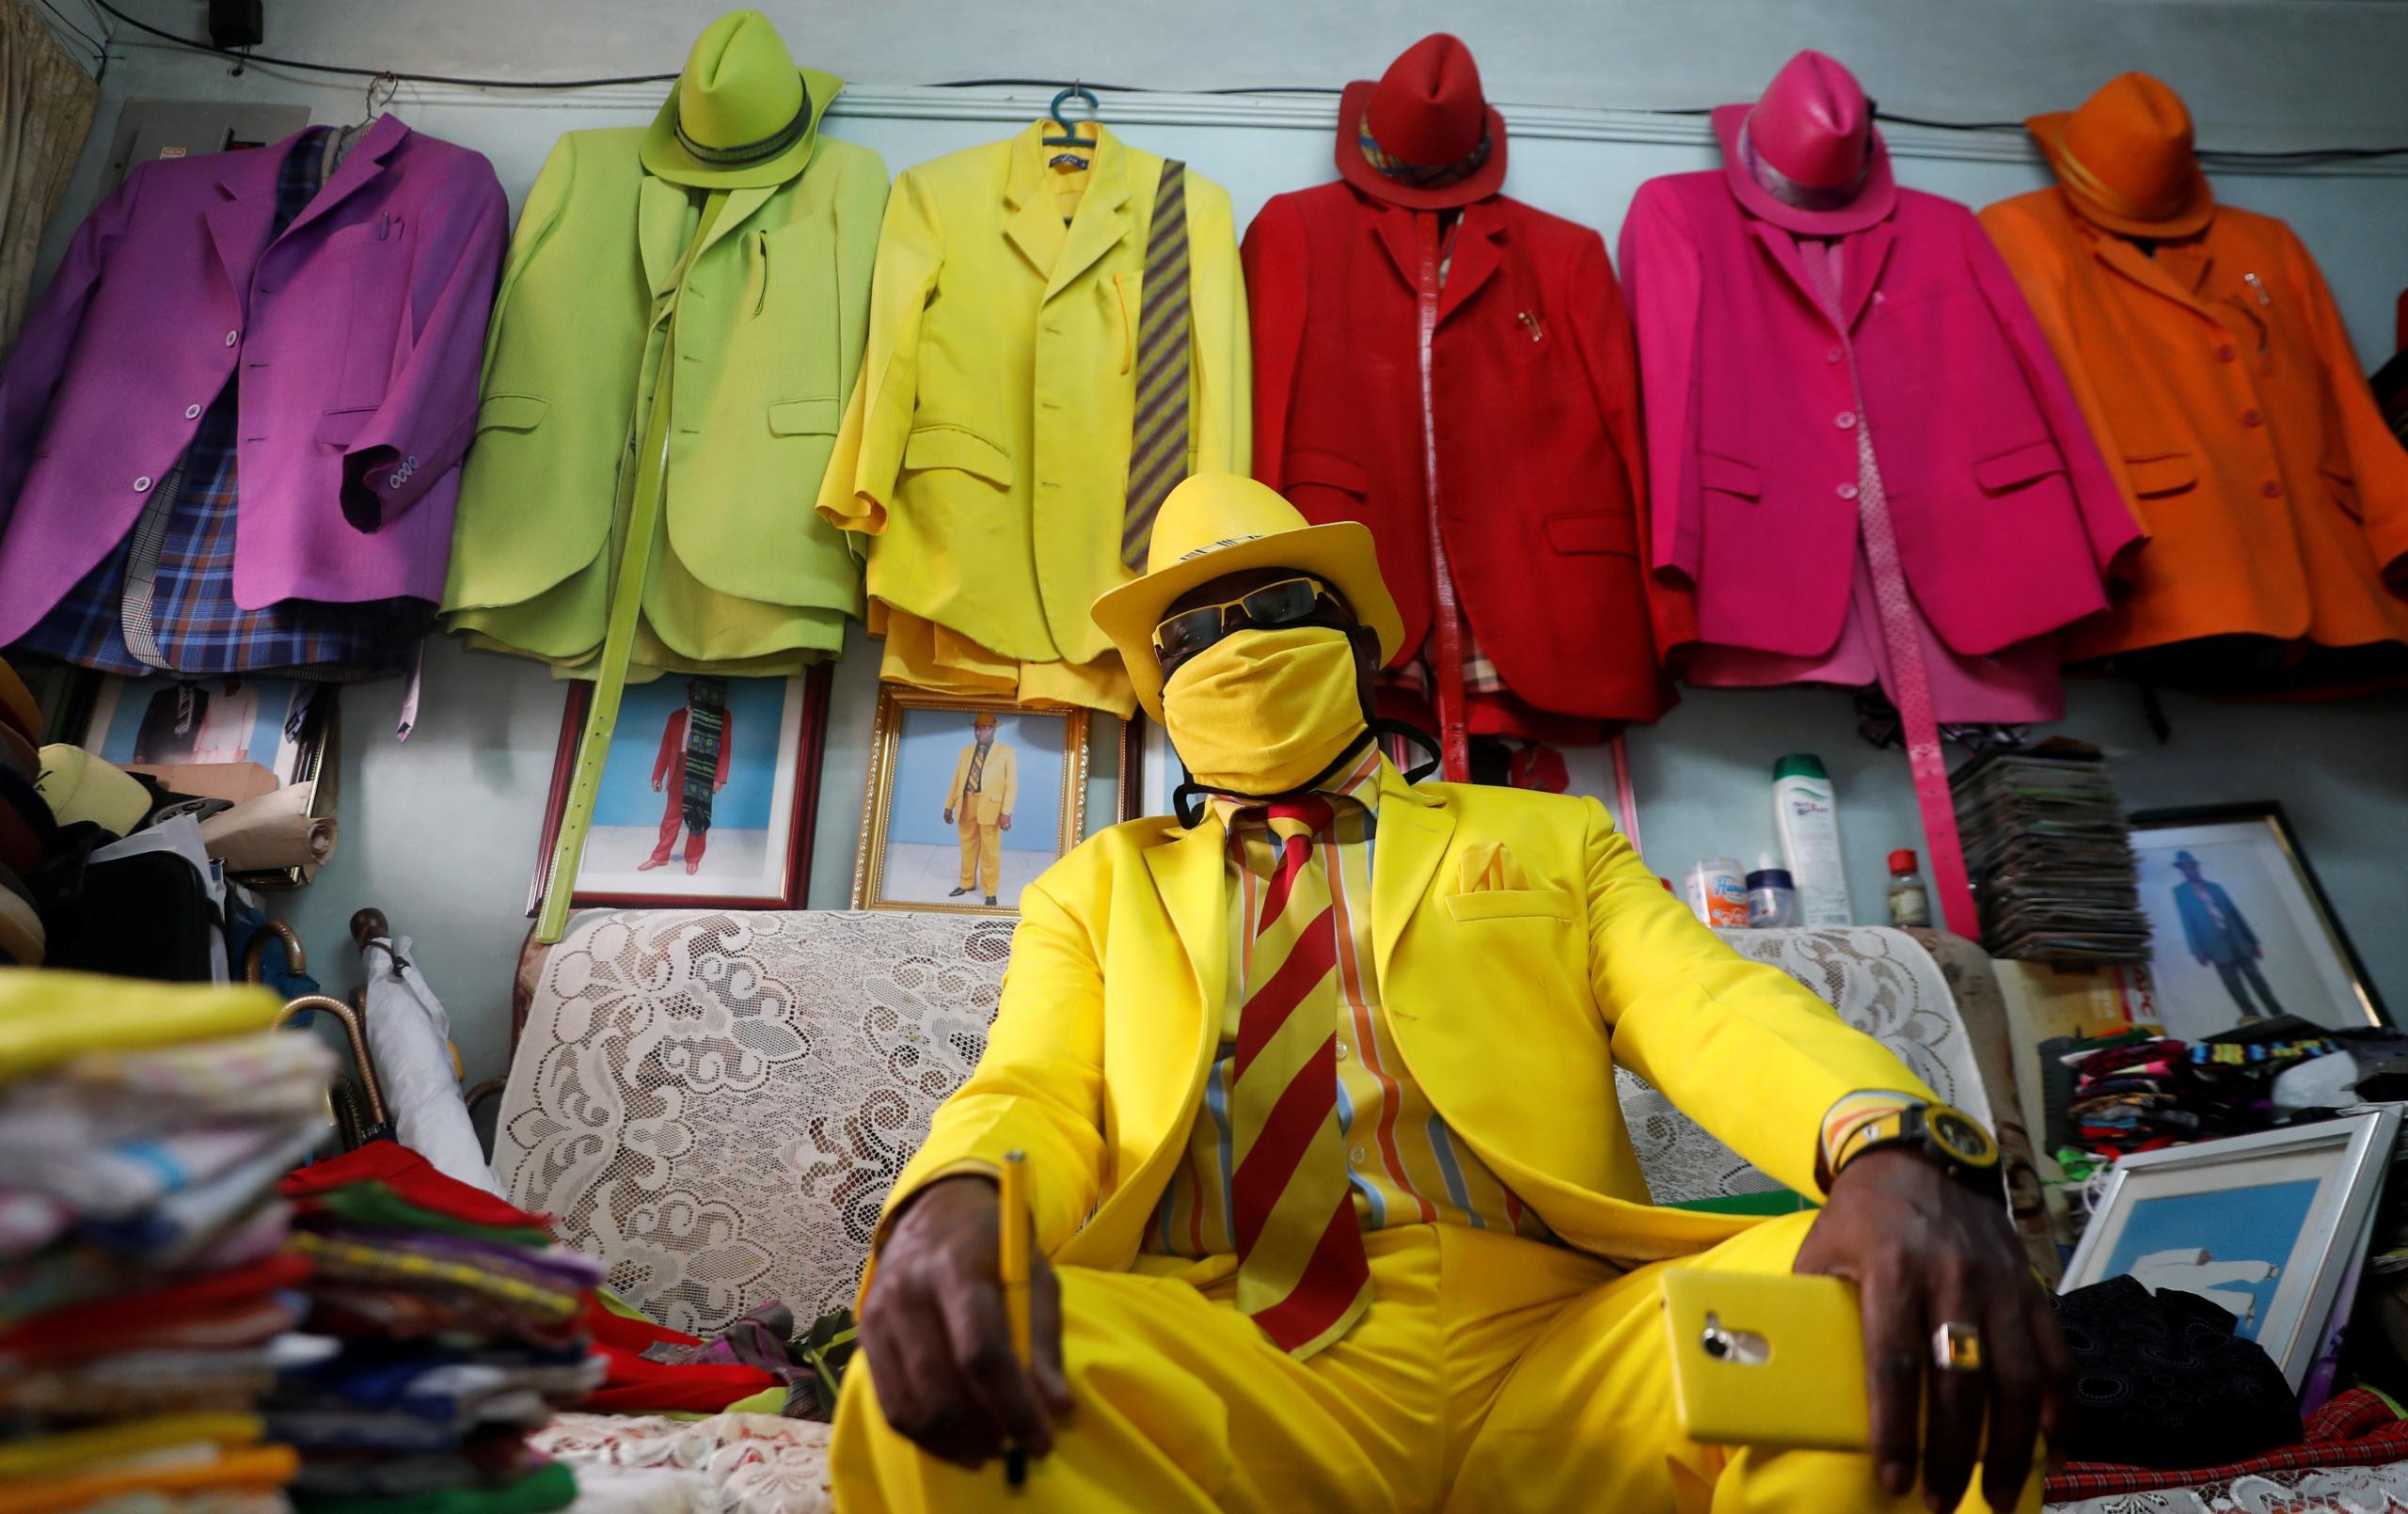 Kenyan fashionista James Maina Mwangi displays attire in Nairobi Reuters